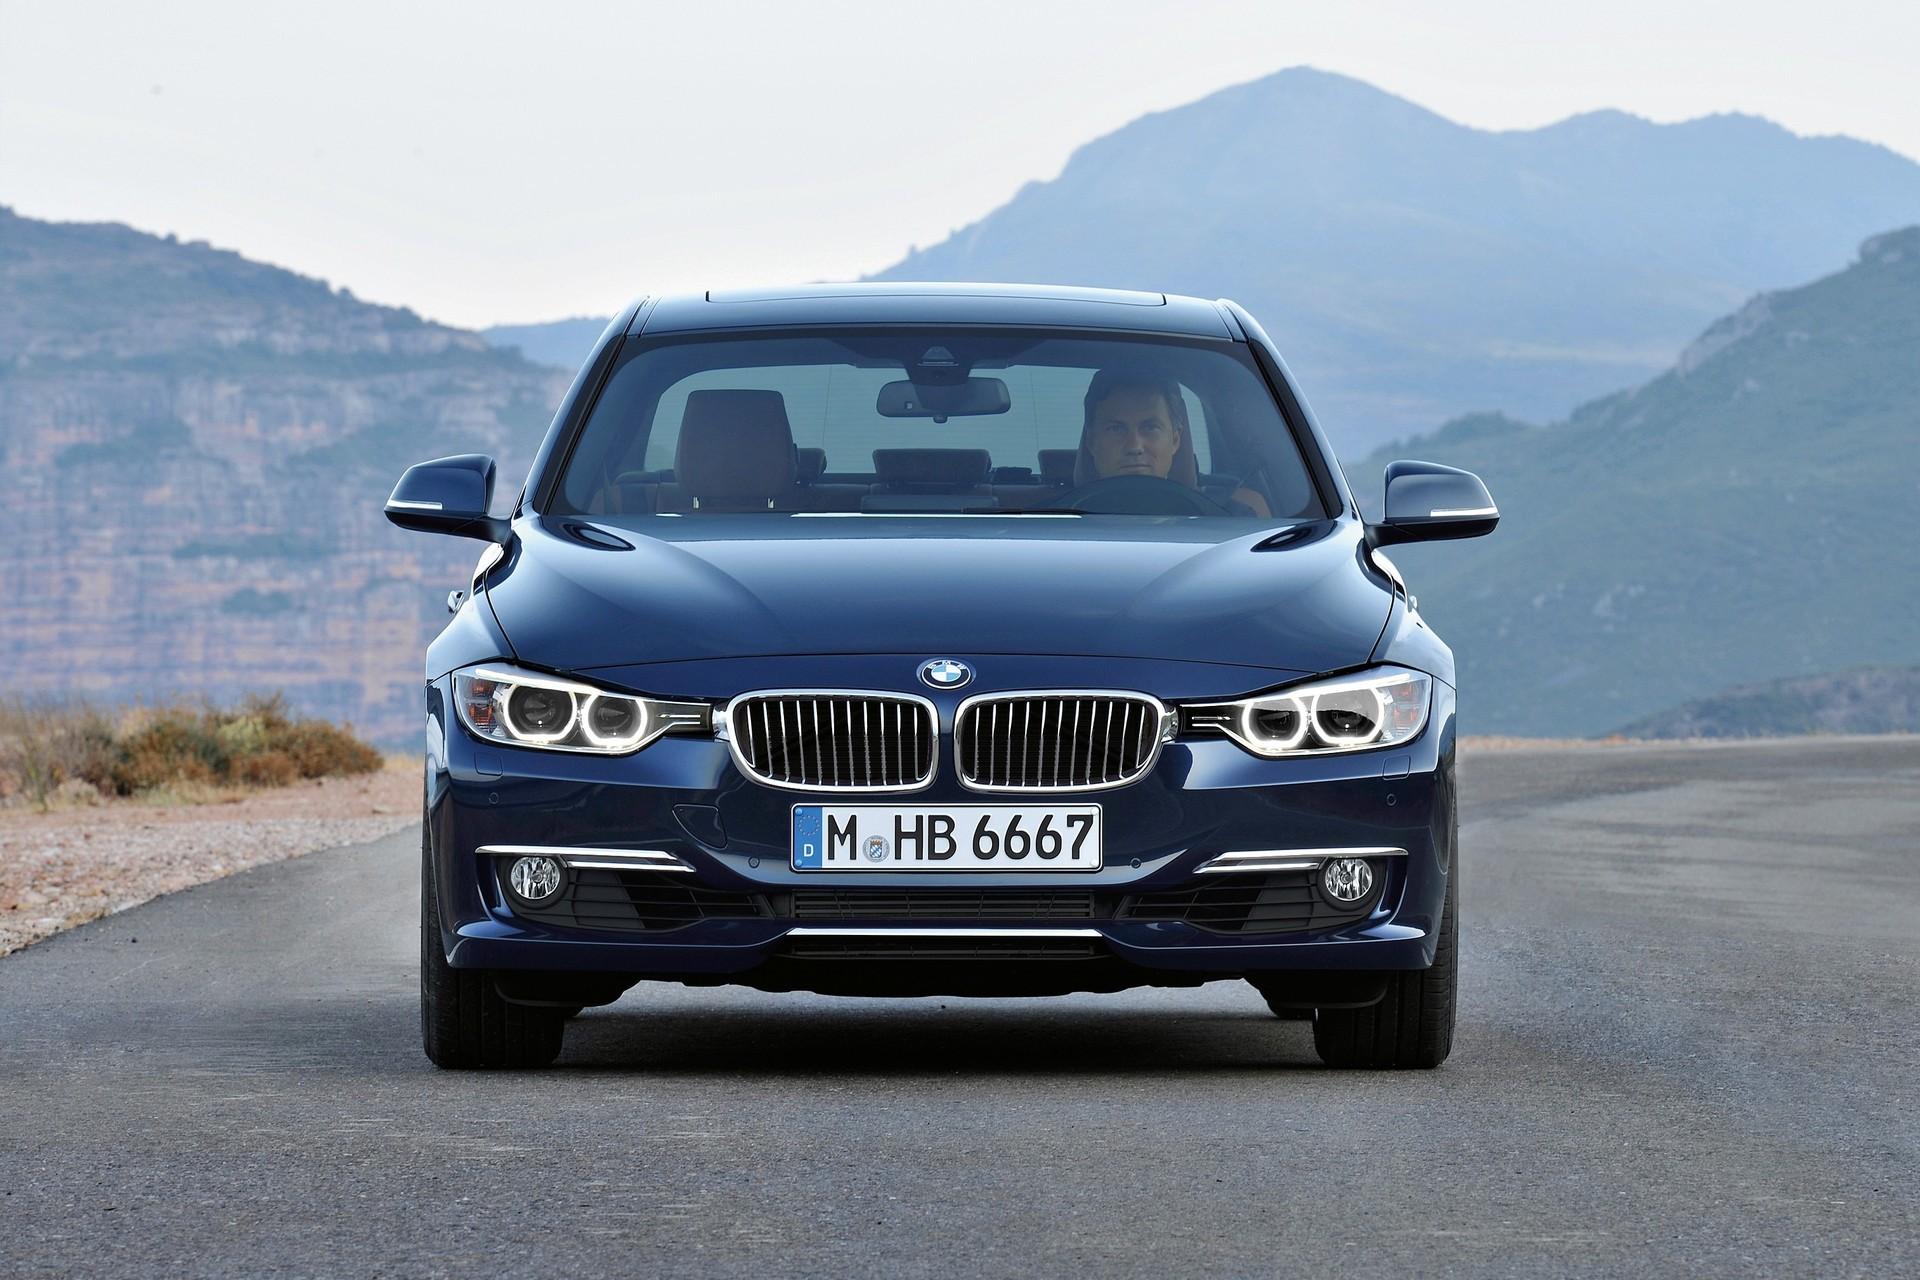 20122015 BMW 3Series Recalled To Fix Exterior Lighting Software